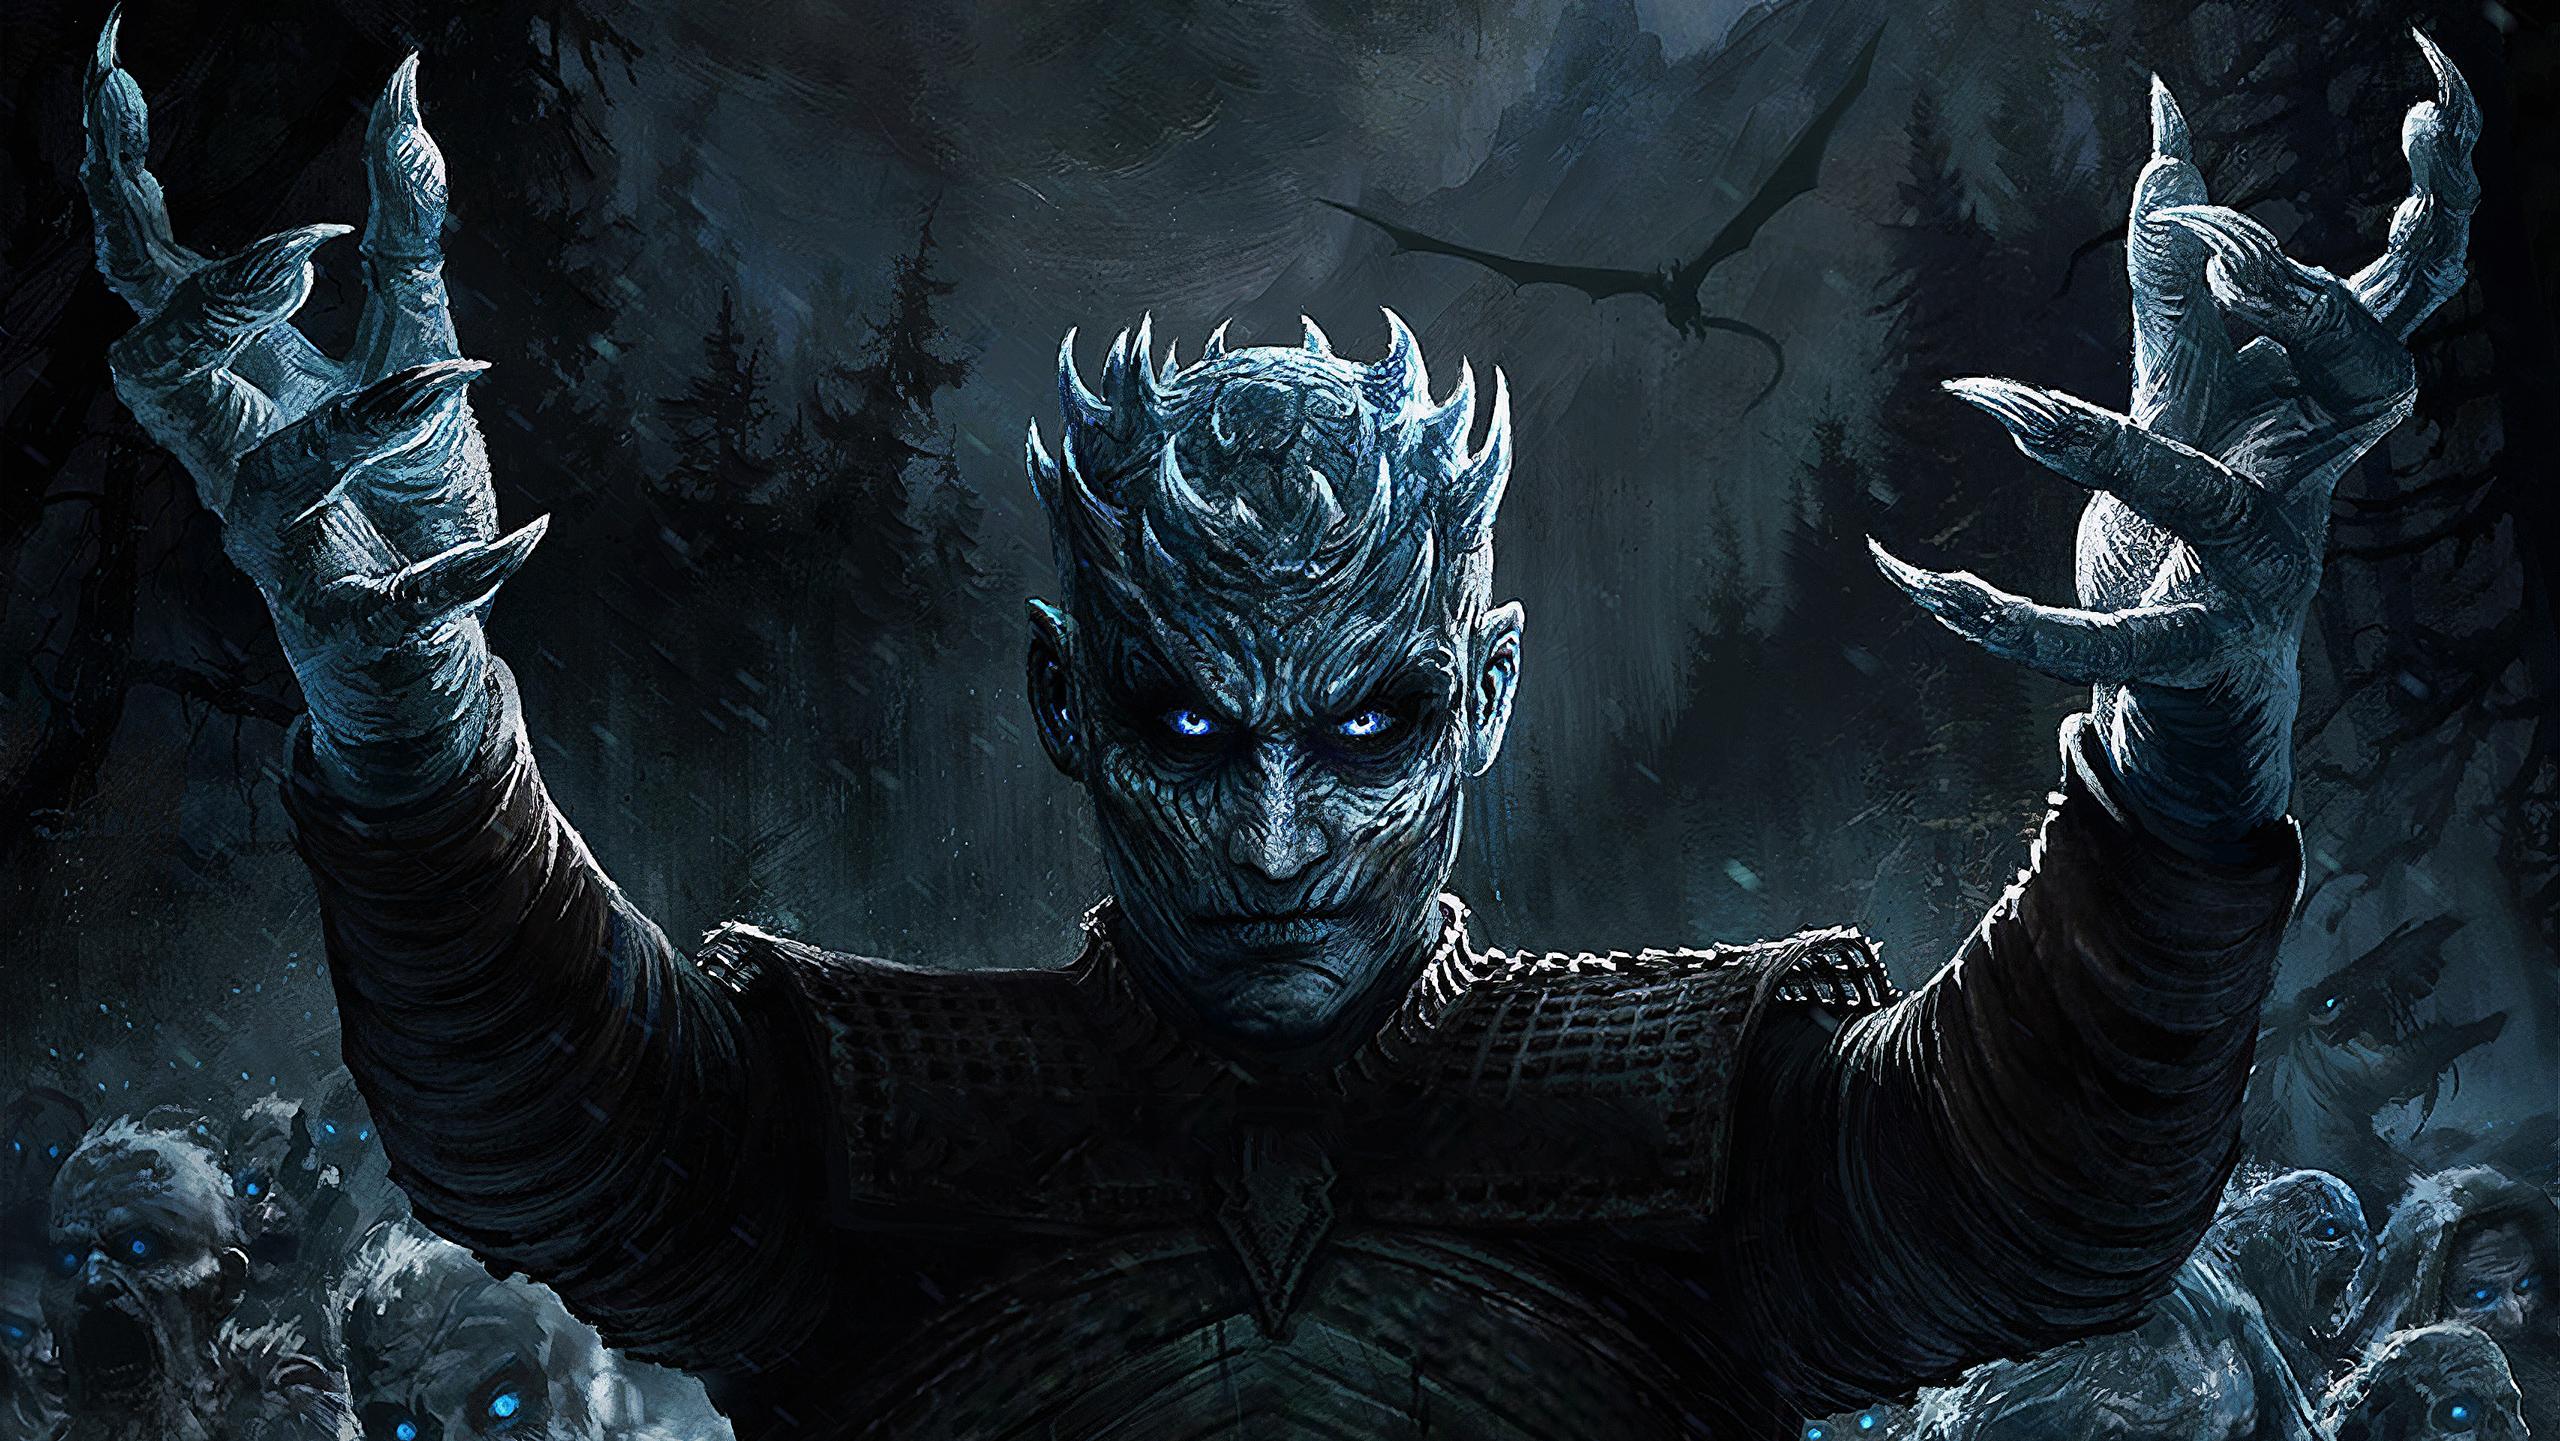 Night King Game Of Thrones Season 8 Art, HD Tv Shows, 4k ...